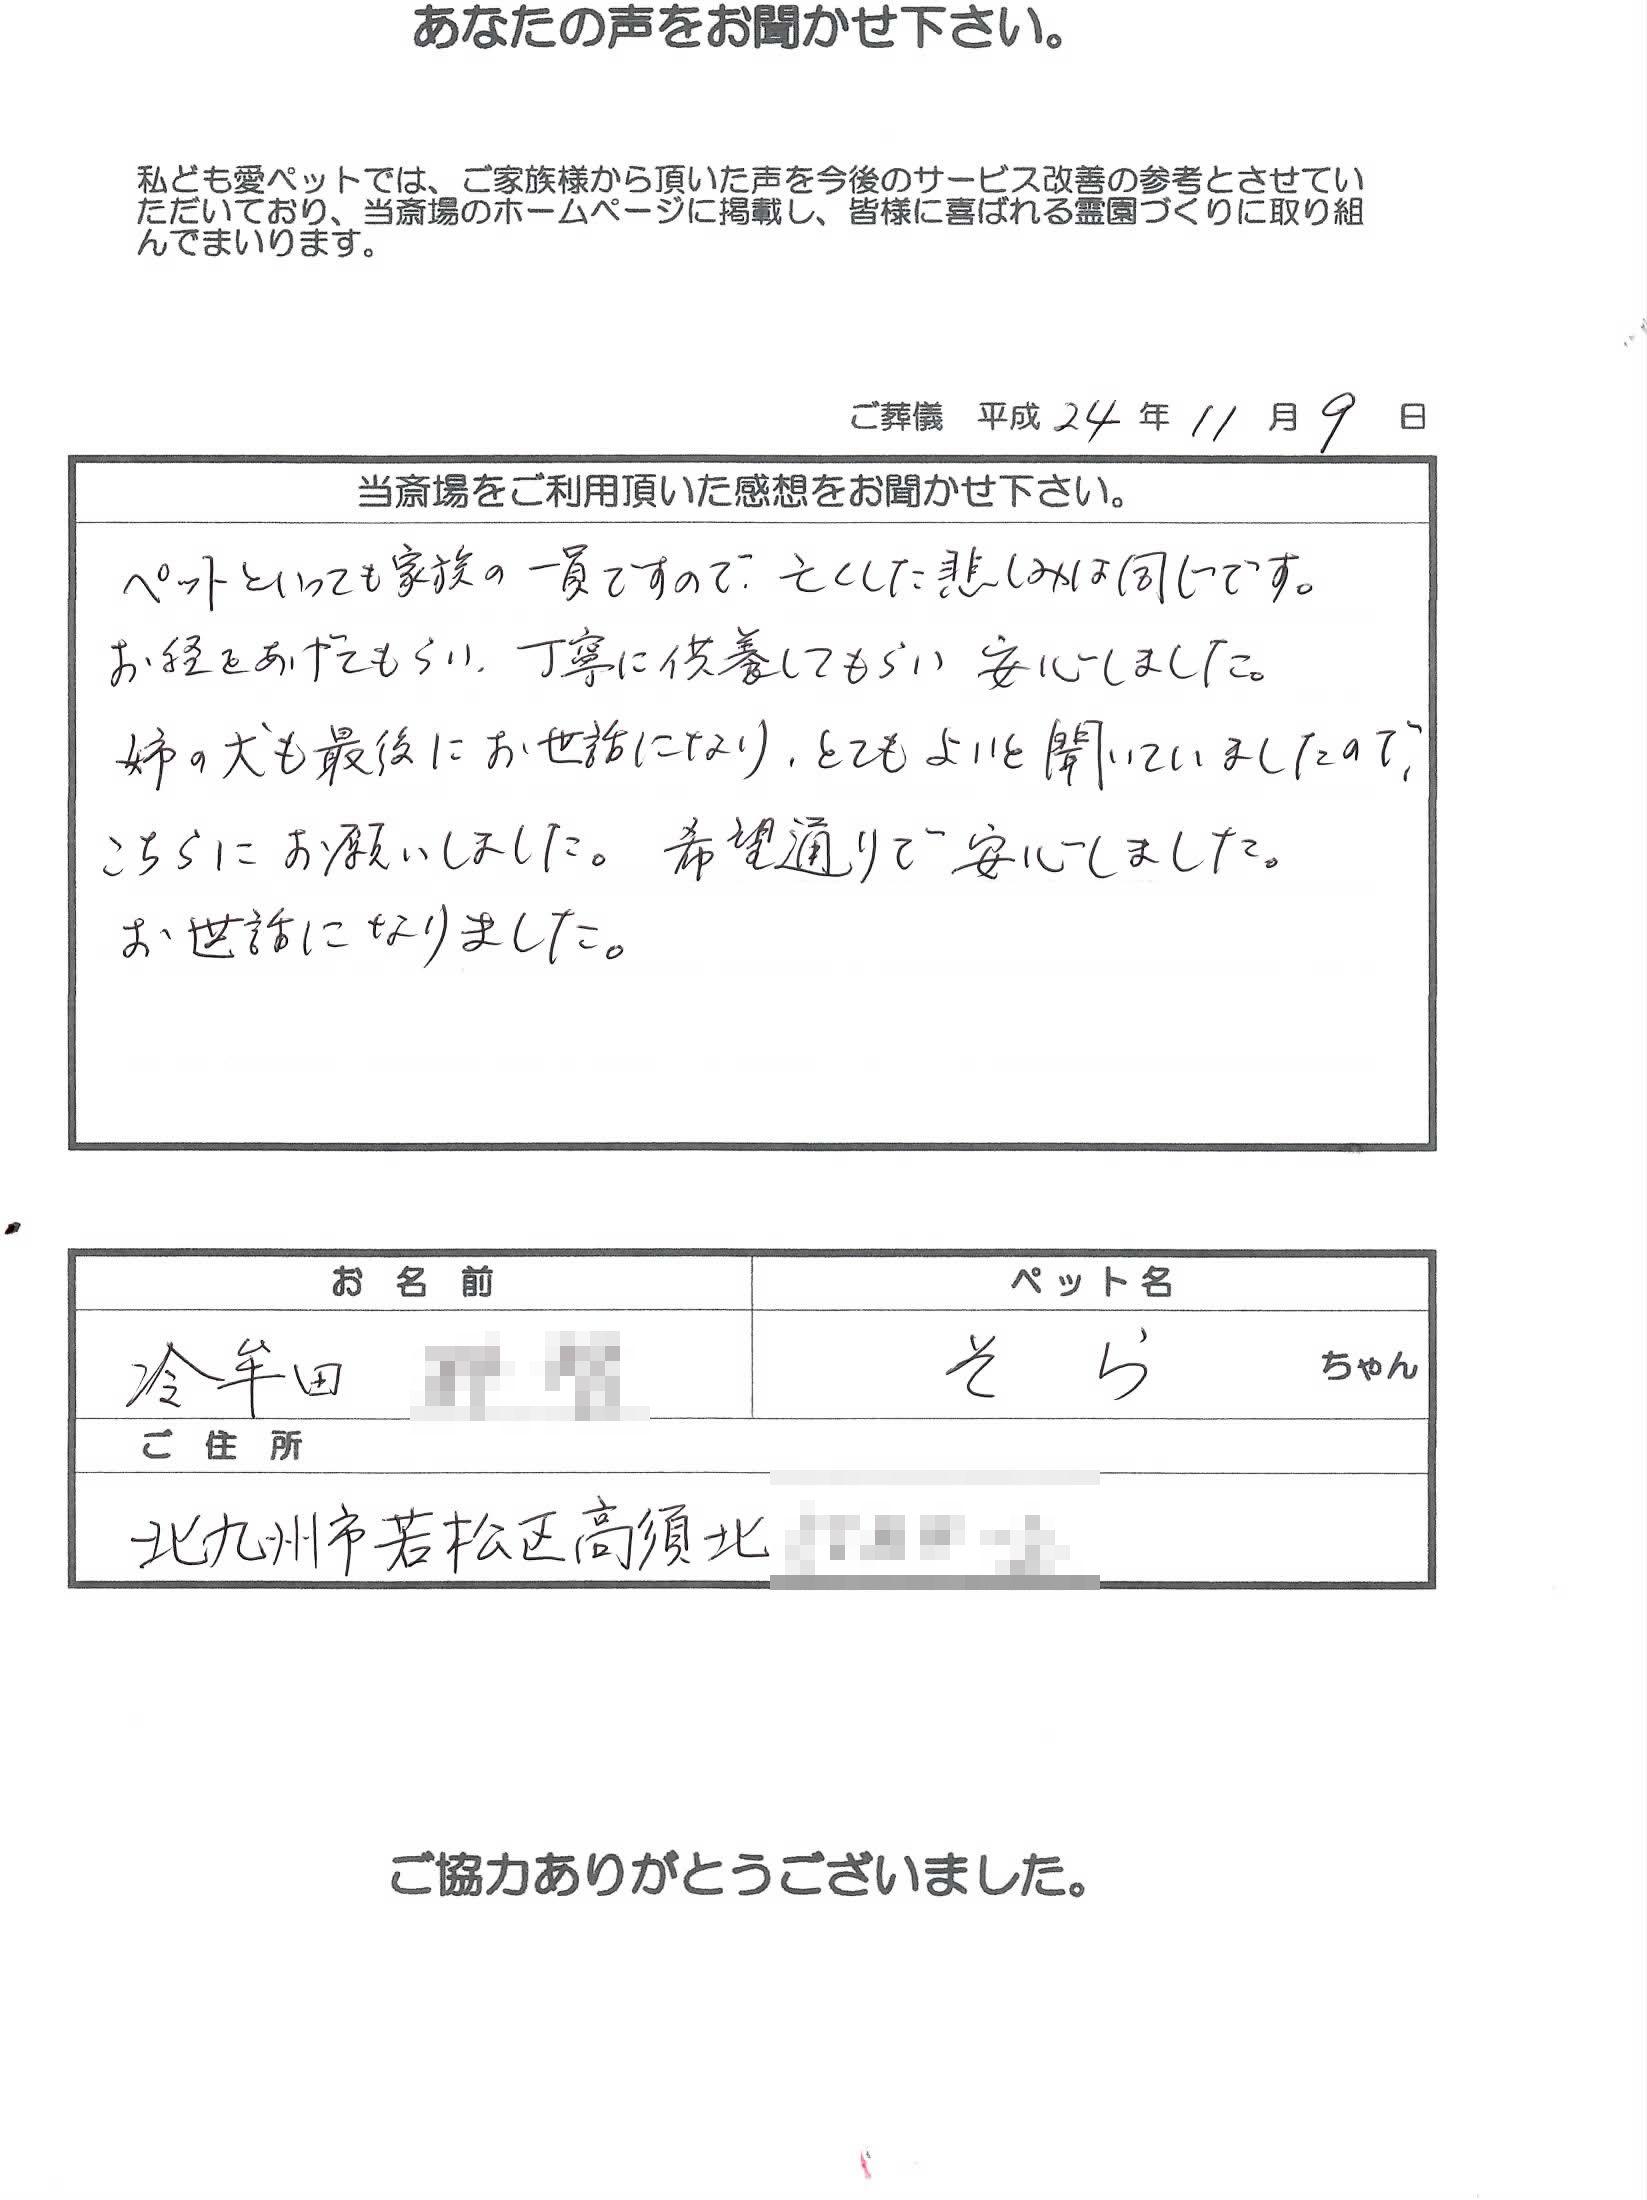 k121109-3.jpg